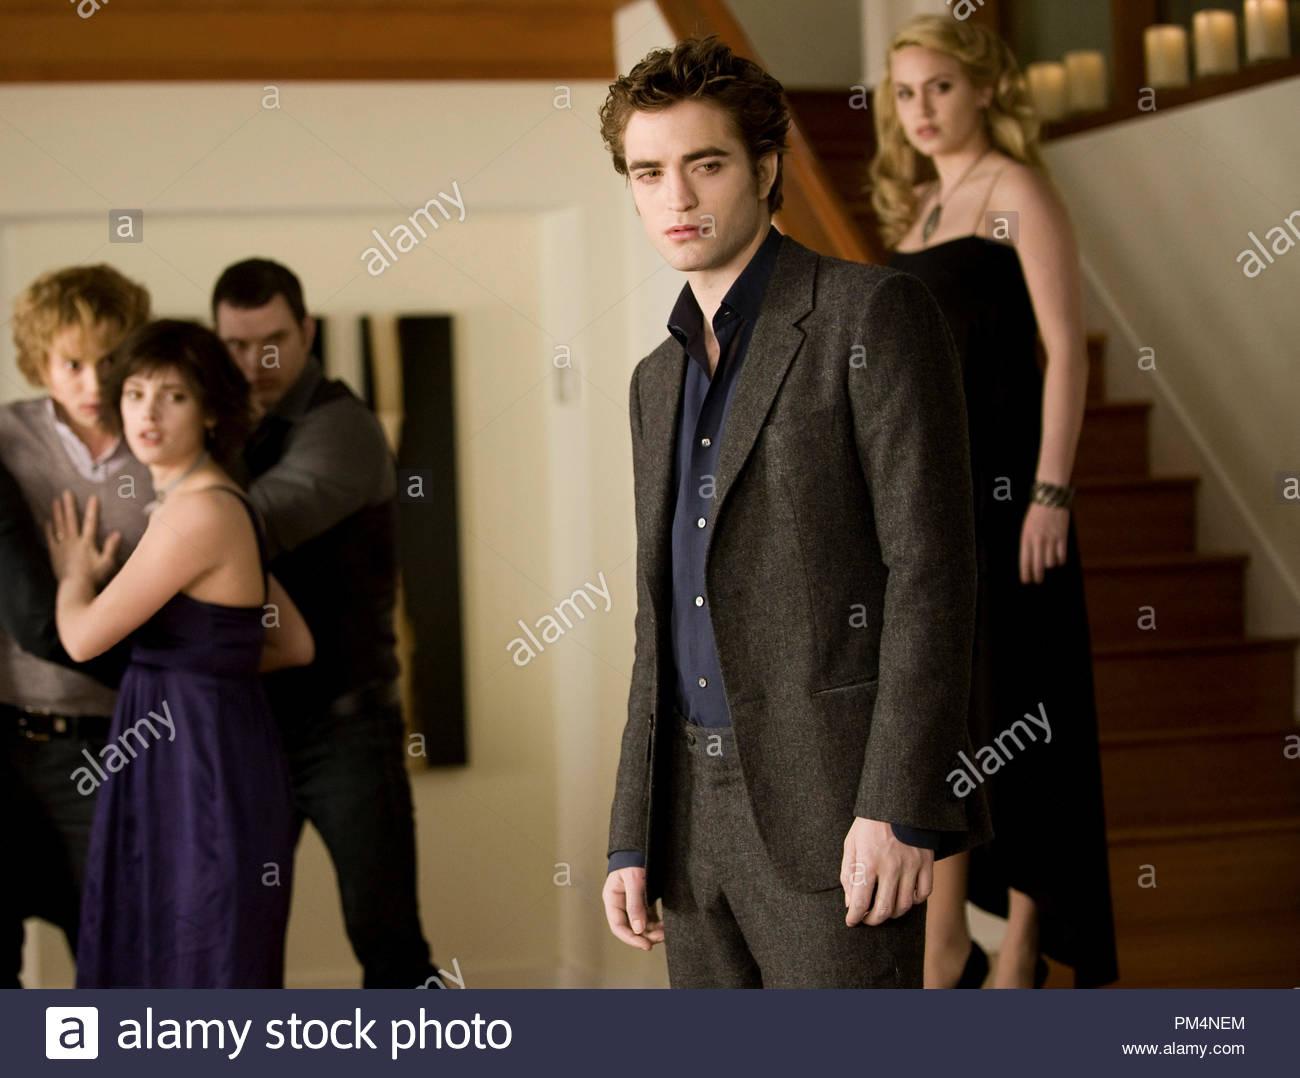 ROBERT PATTINSON stars as Edward Cullen, KRISTEN STEWART